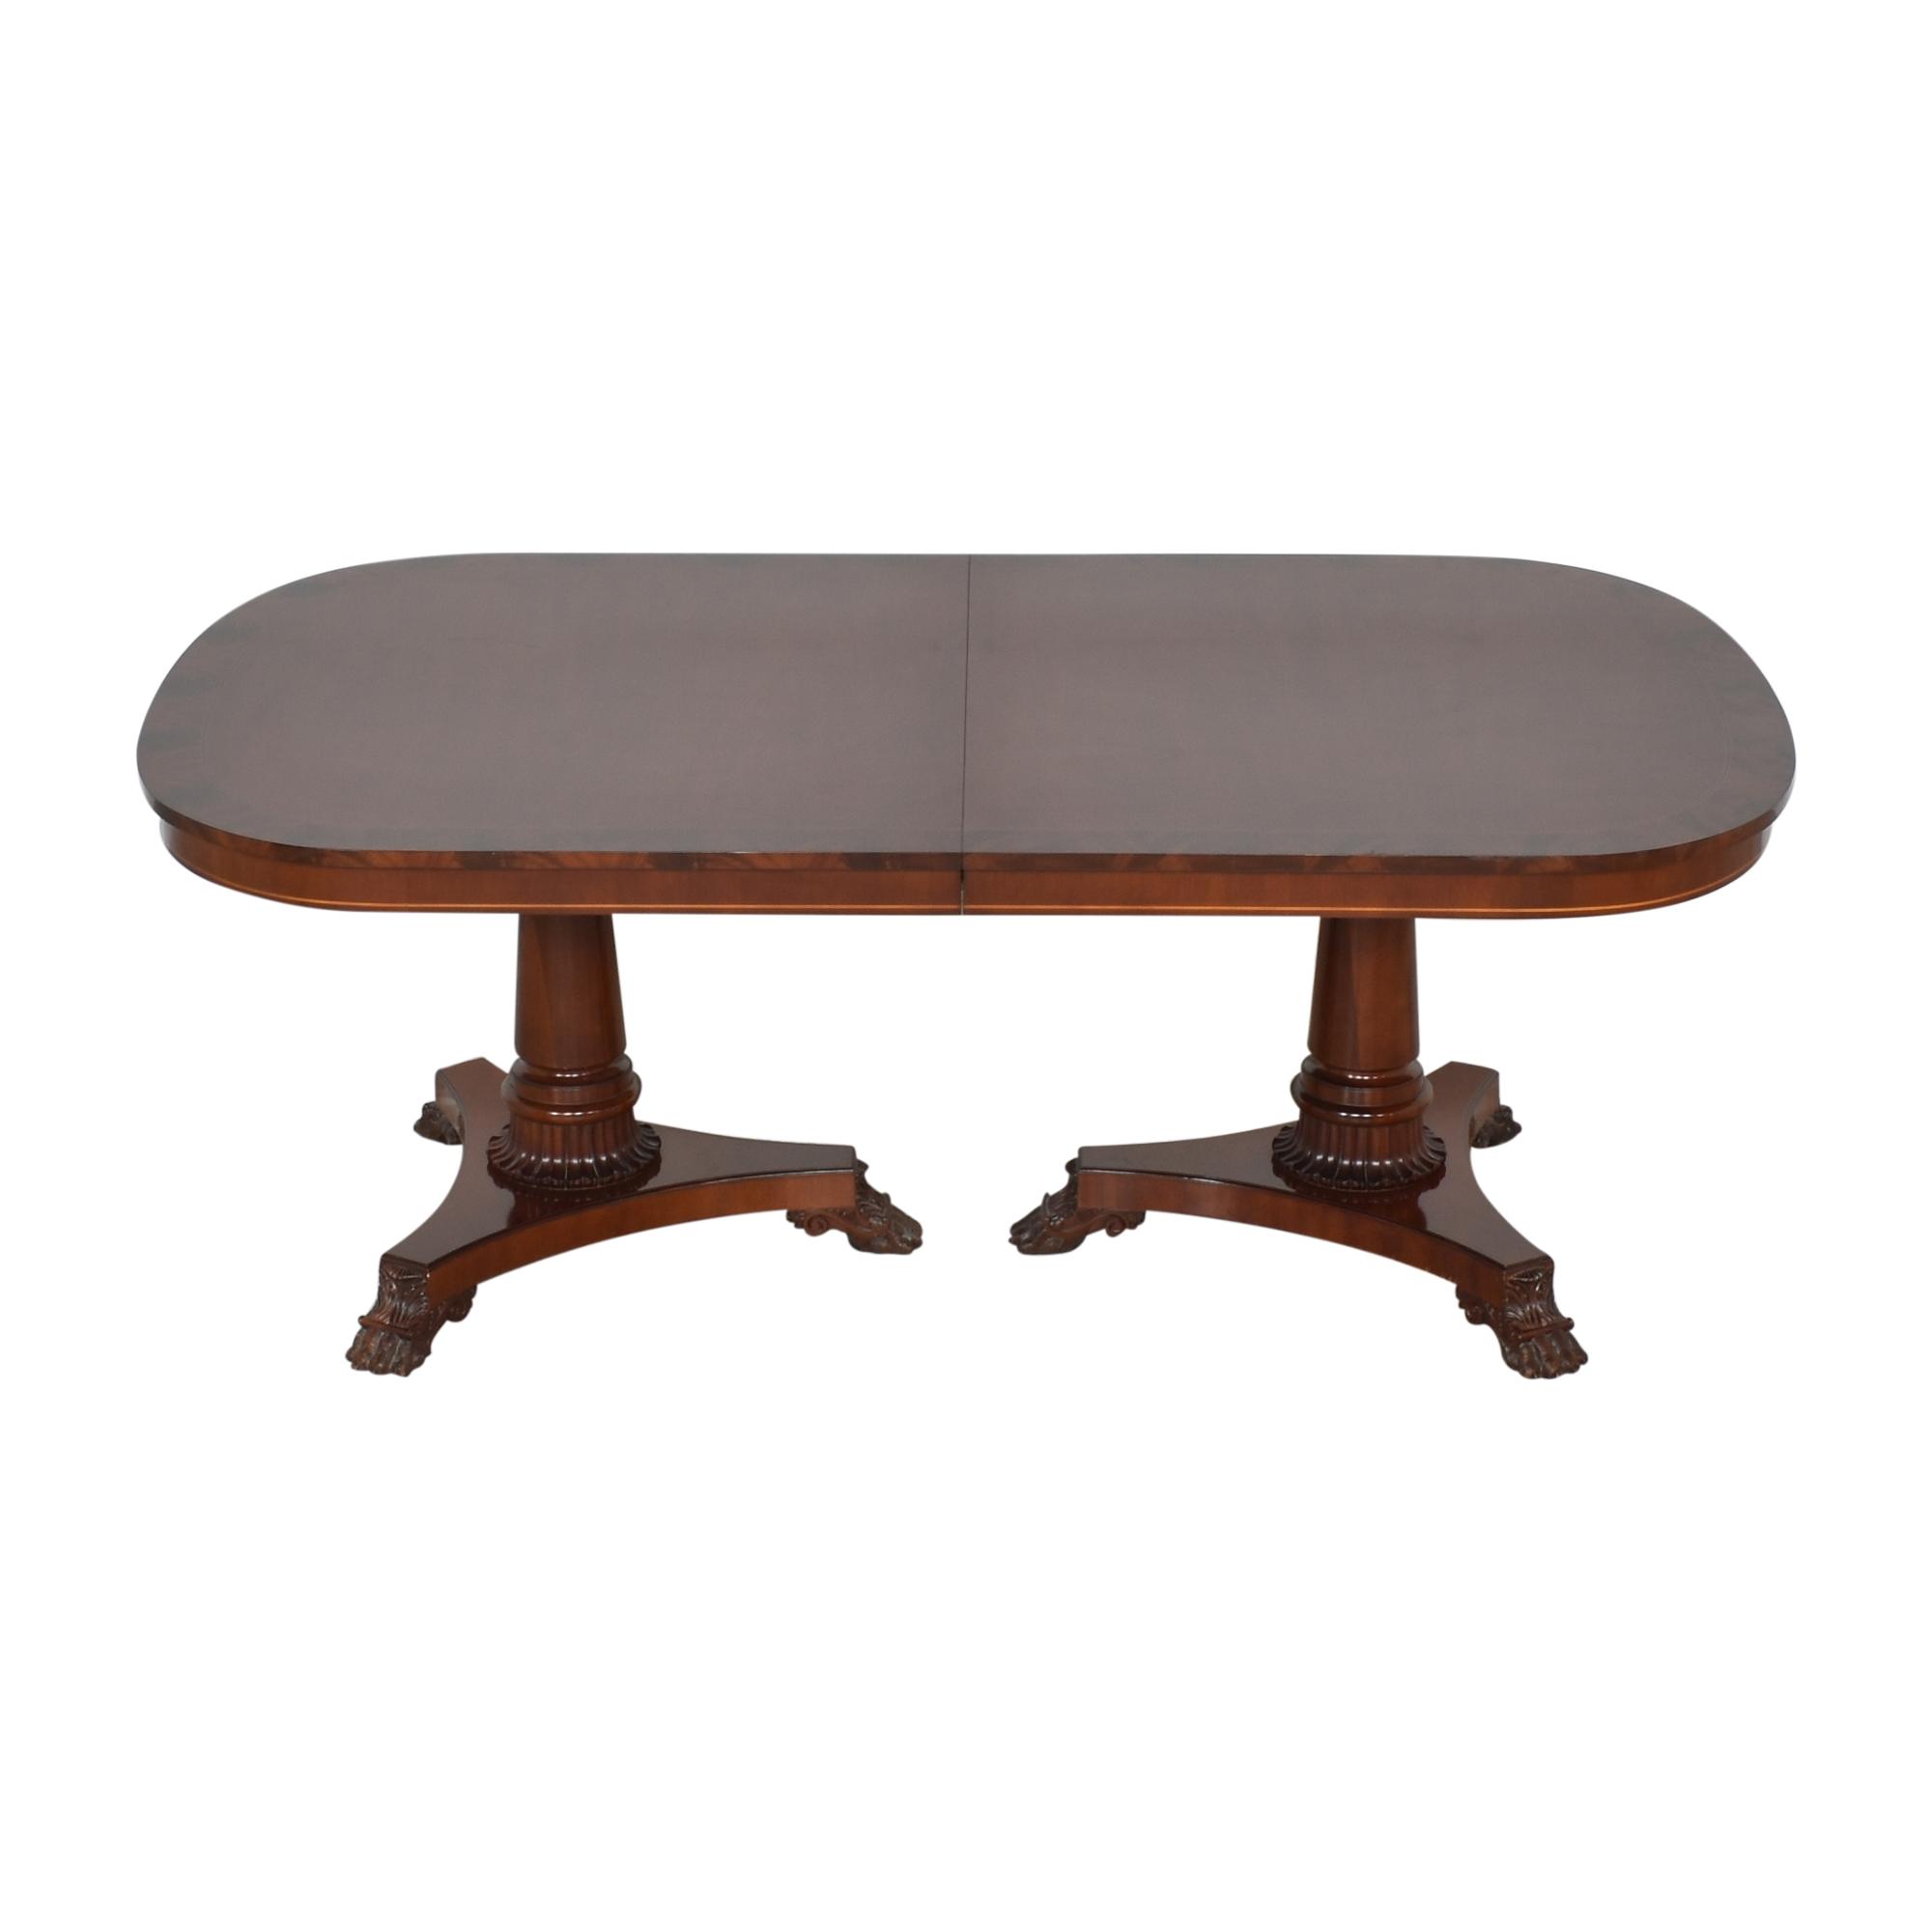 buy Kindel Extendable Double Pedestal Dining Table Kindel Tables